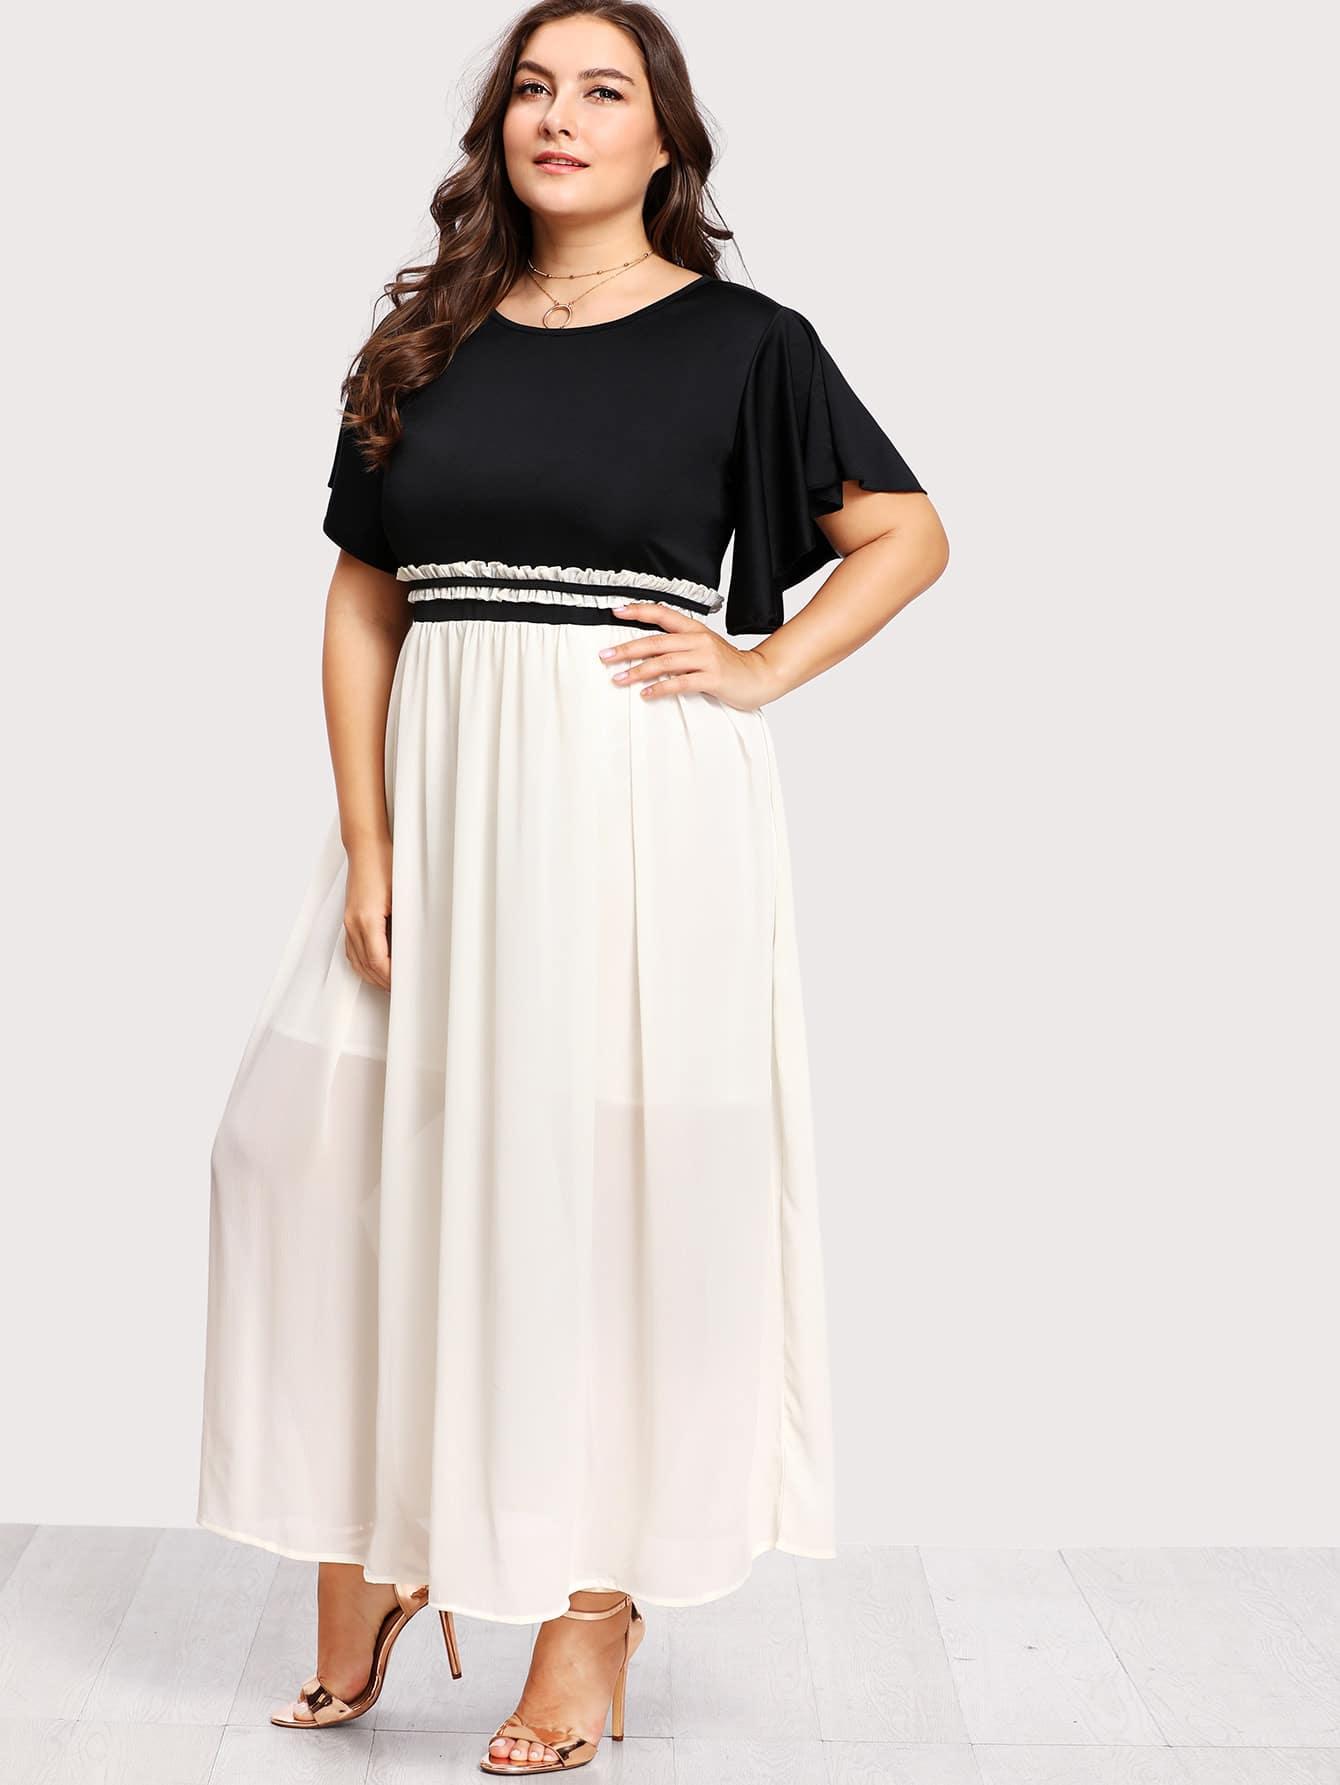 Flutter Sleeve Frilled Two Tone Dress two tone letter print full length dress